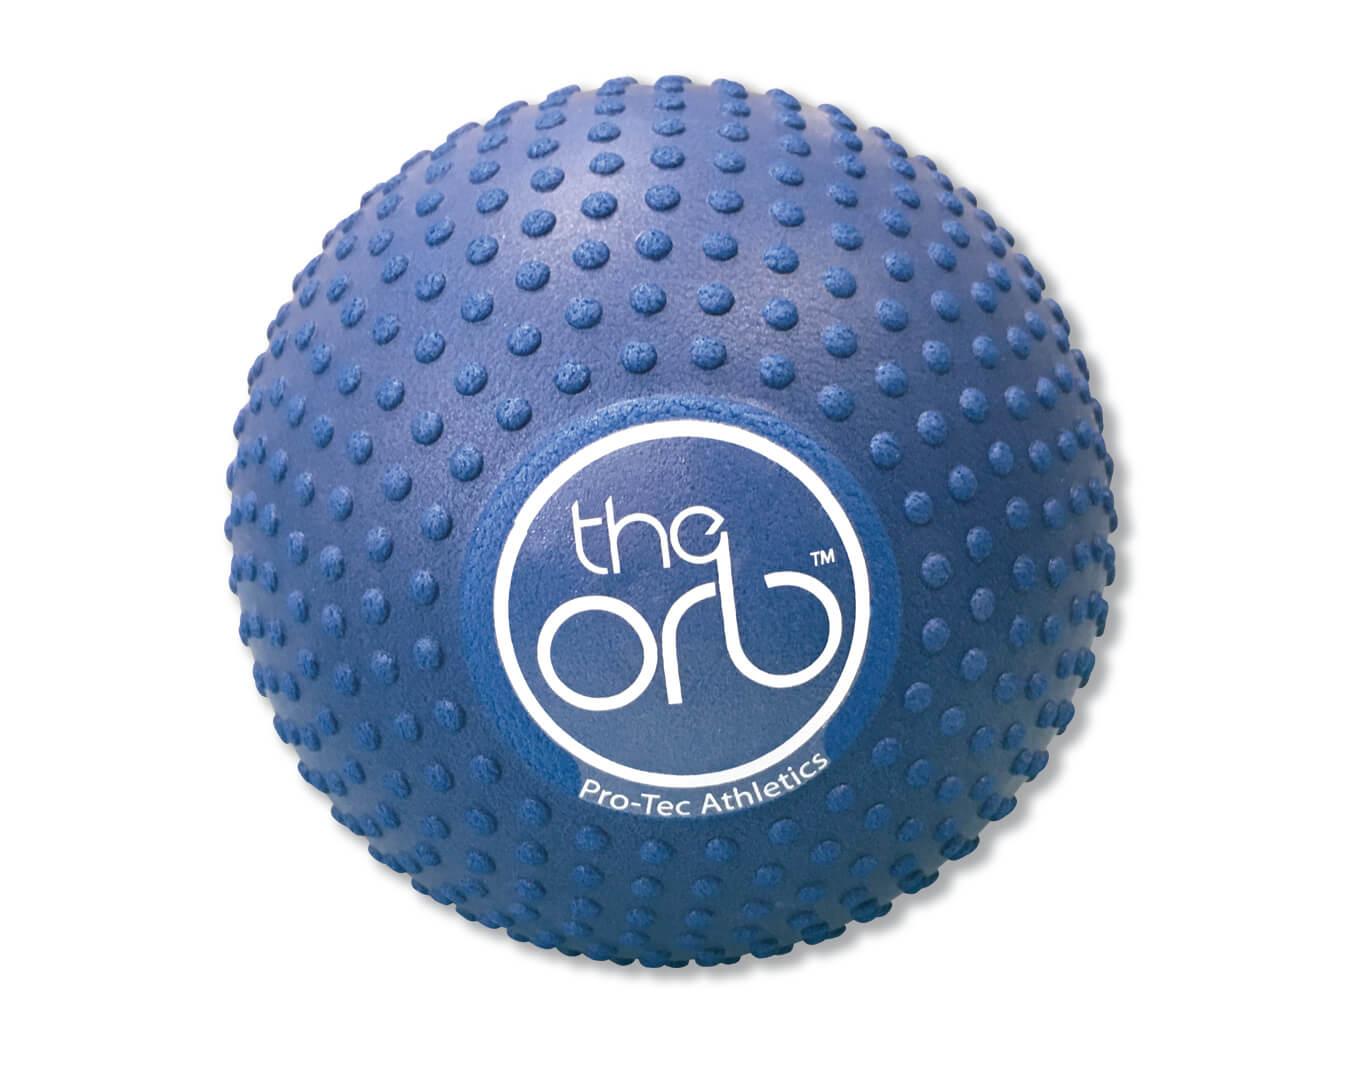 ◇PRO-TEC ATHLETICS・The Orb マッサージボール-5(ブルー)